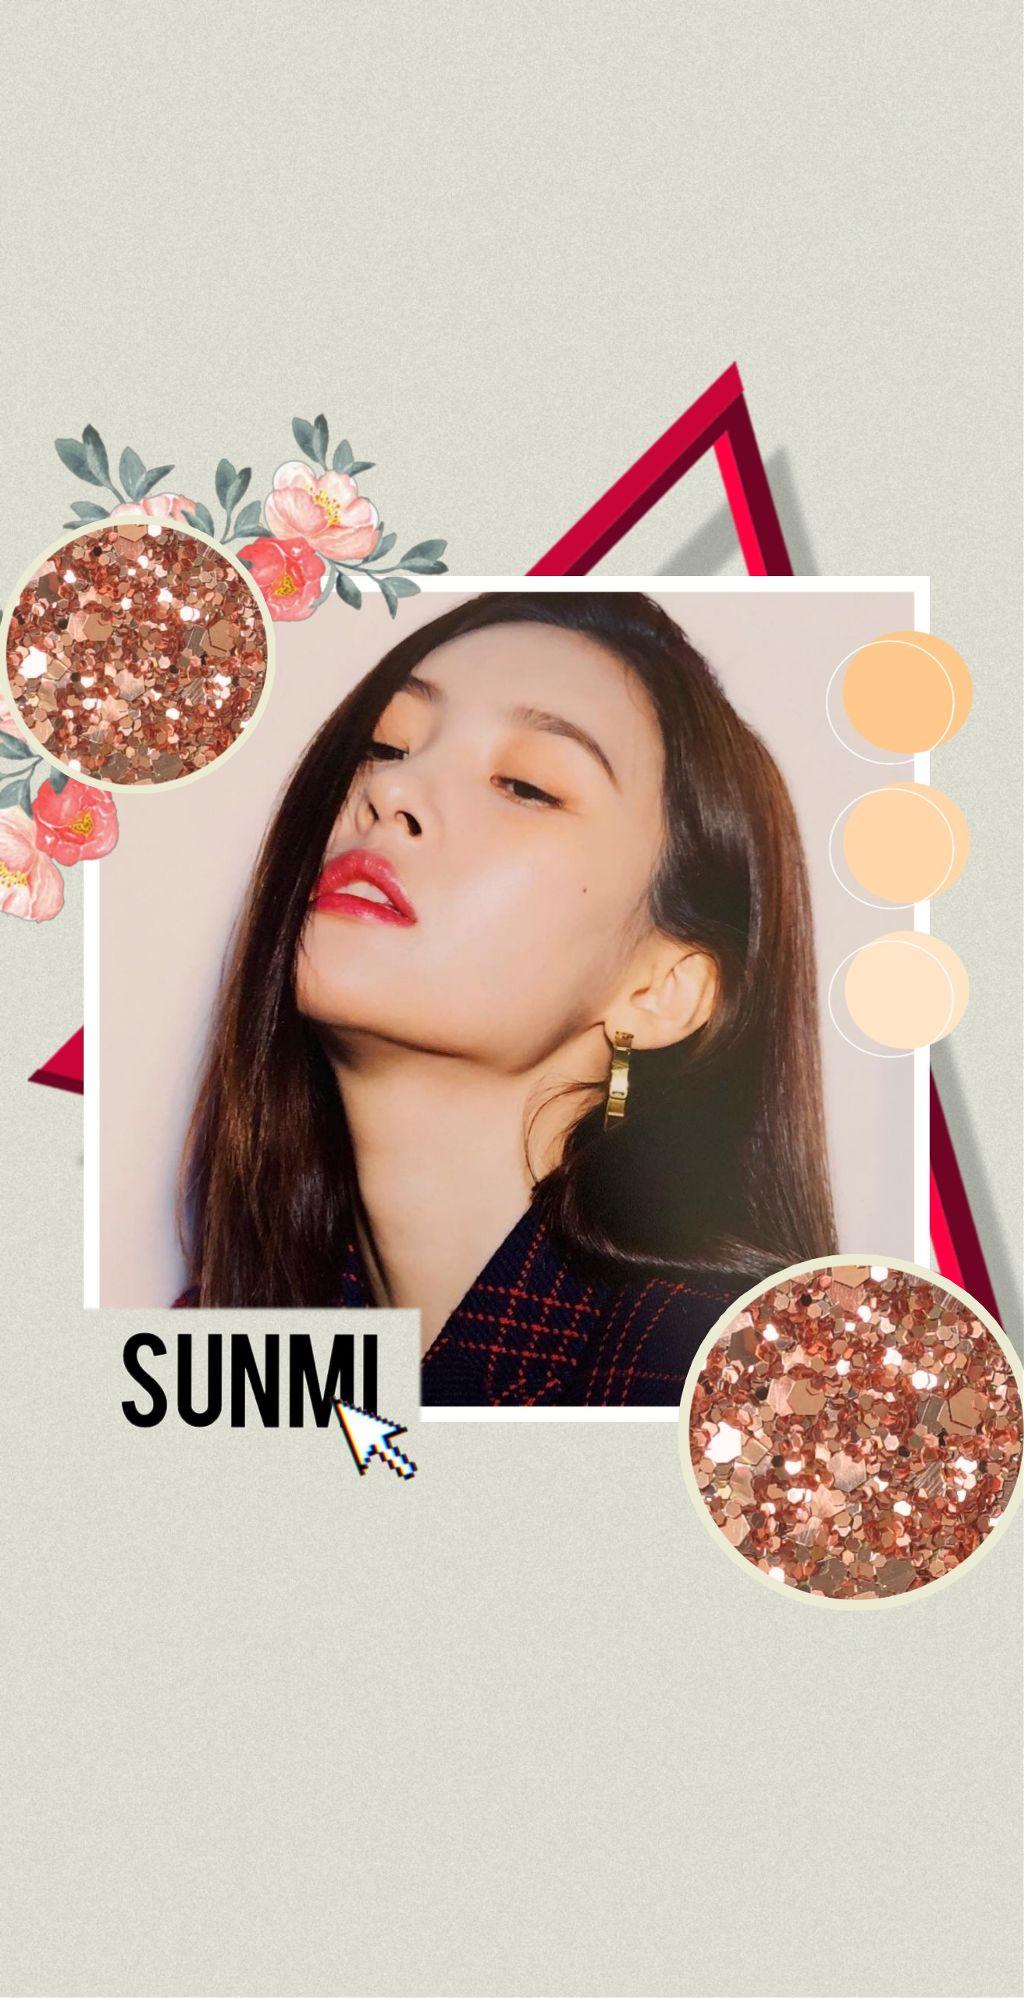 💛 Happy Sunmi Day! 💛 -Longassride #freetoedit #lee #sunmi #leesunmi #sunmilee #kpop #edit #background #wallpaper #lockscreen #aesthetic #wondergirls  Credits: